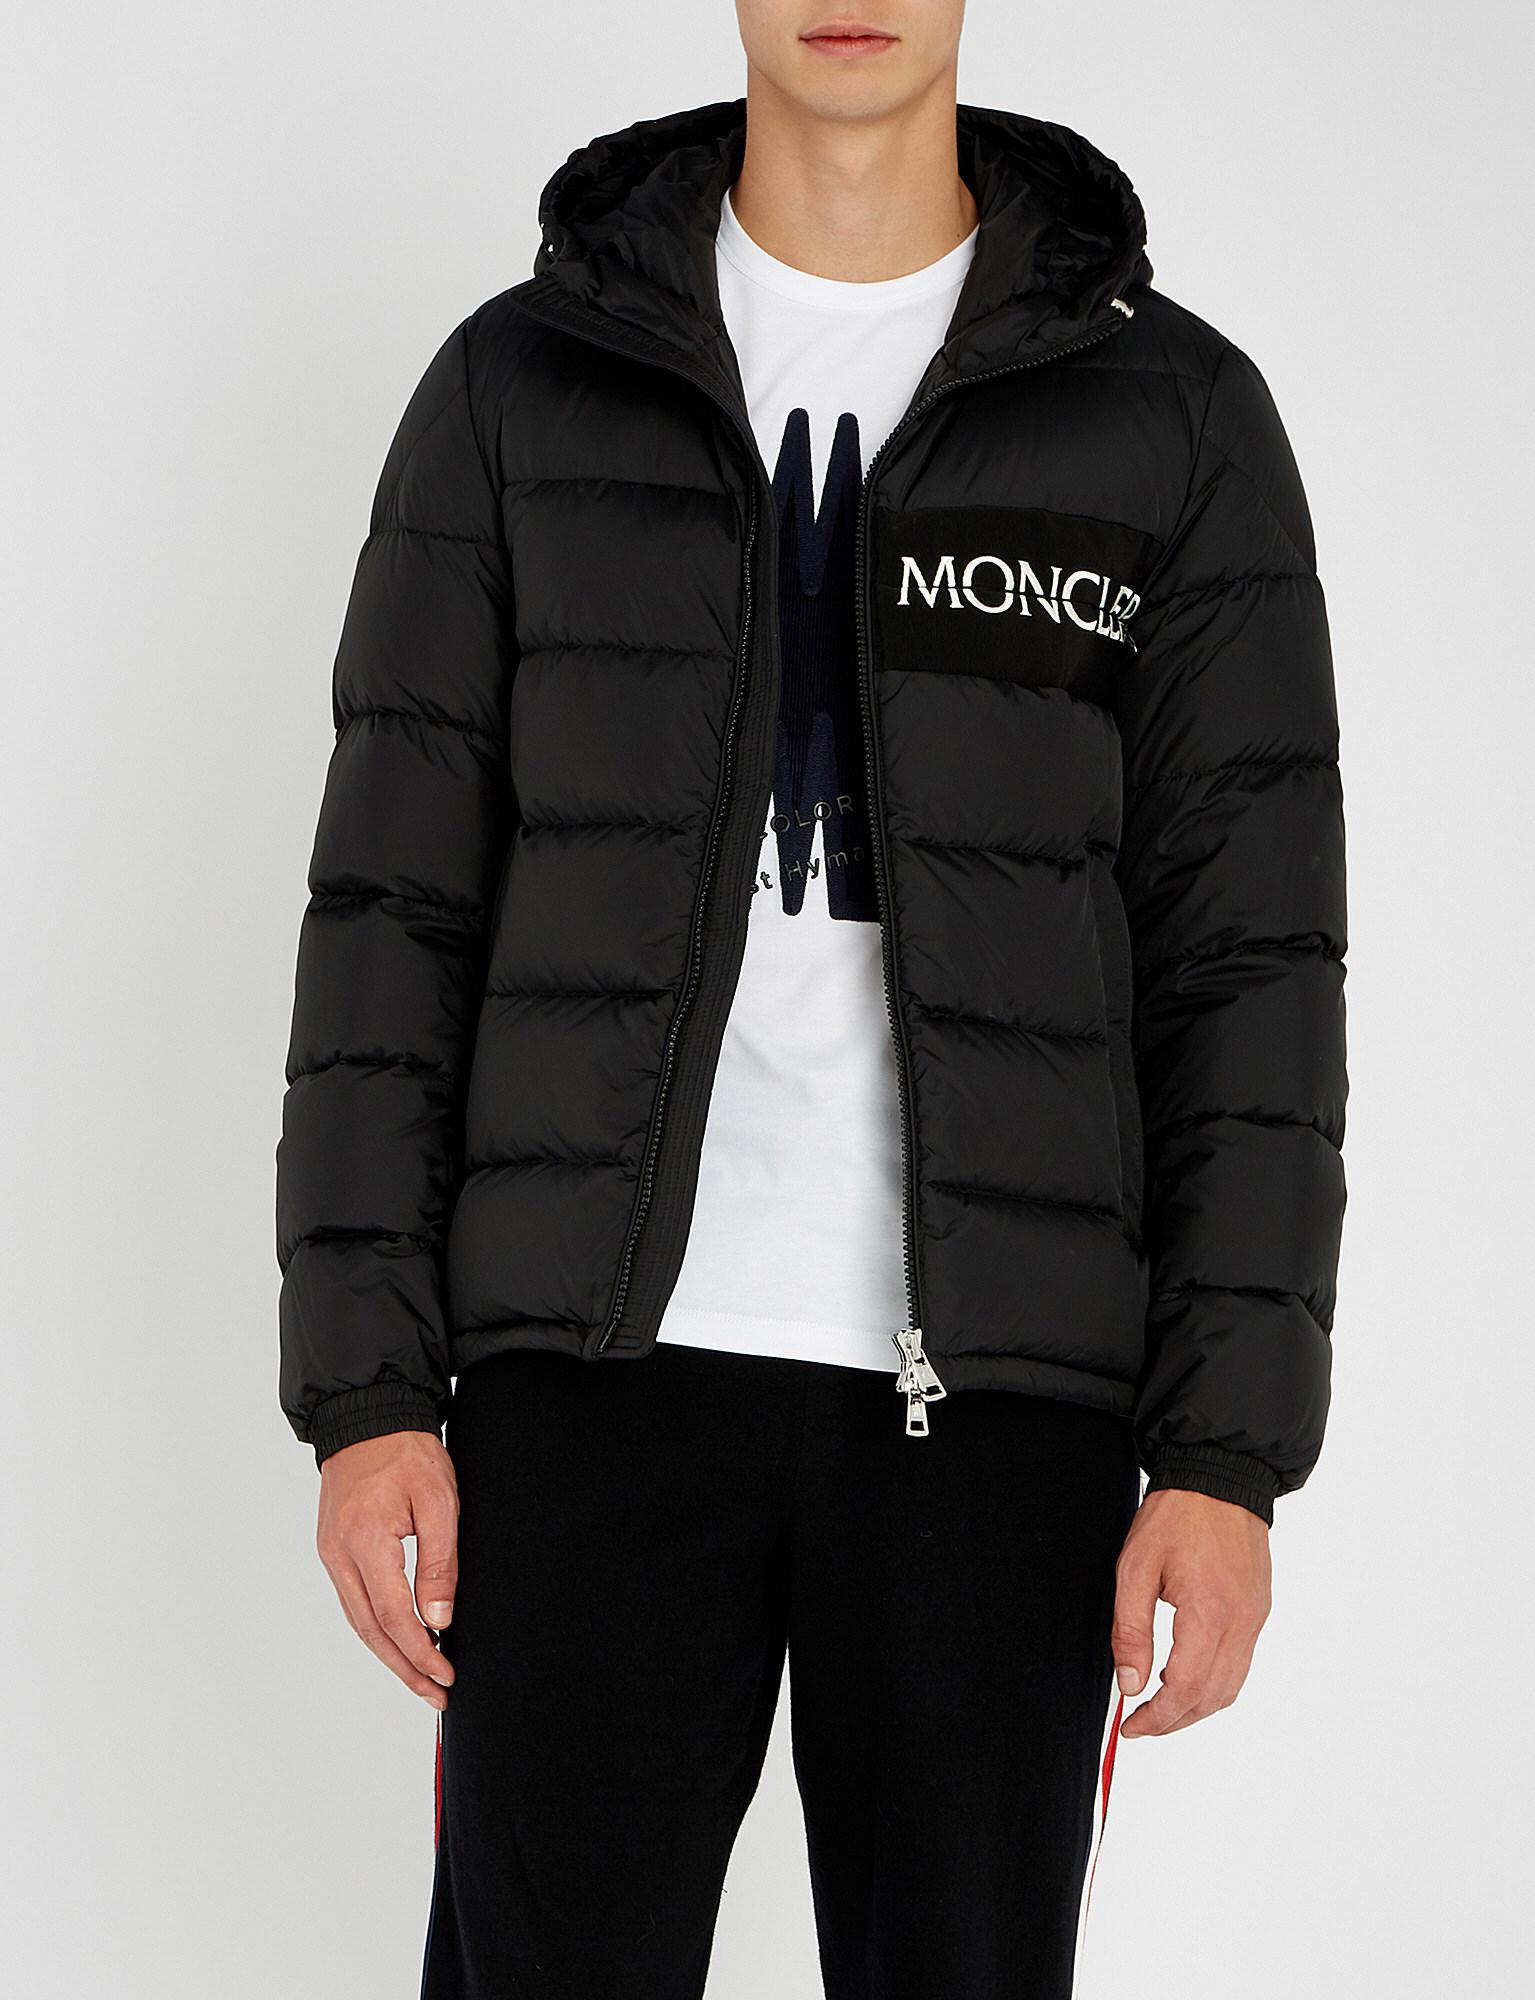 0bbf20c1a denmark moncler jackets mens selfridges opening times bb0f1 61a7e